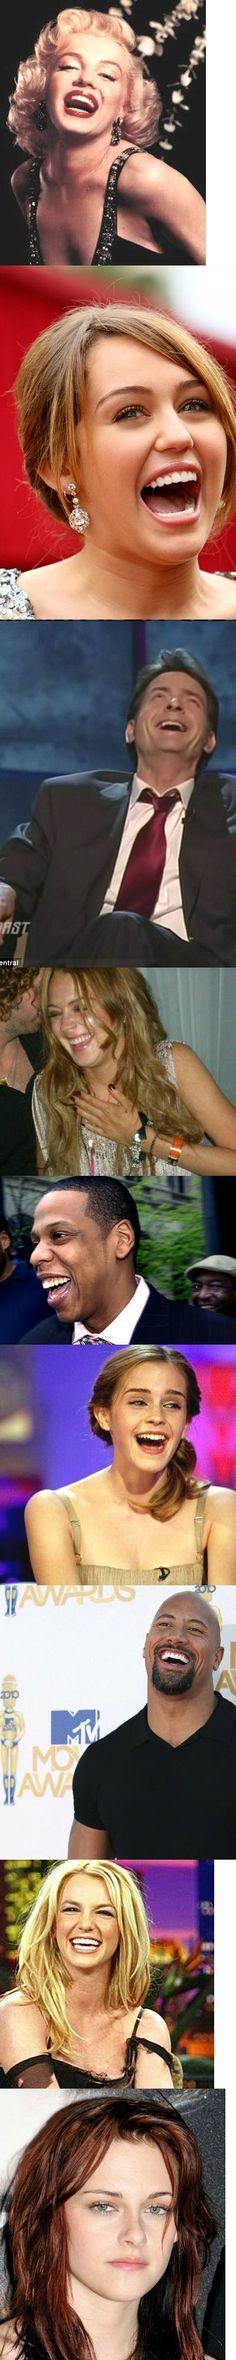 How Celebrities Laugh